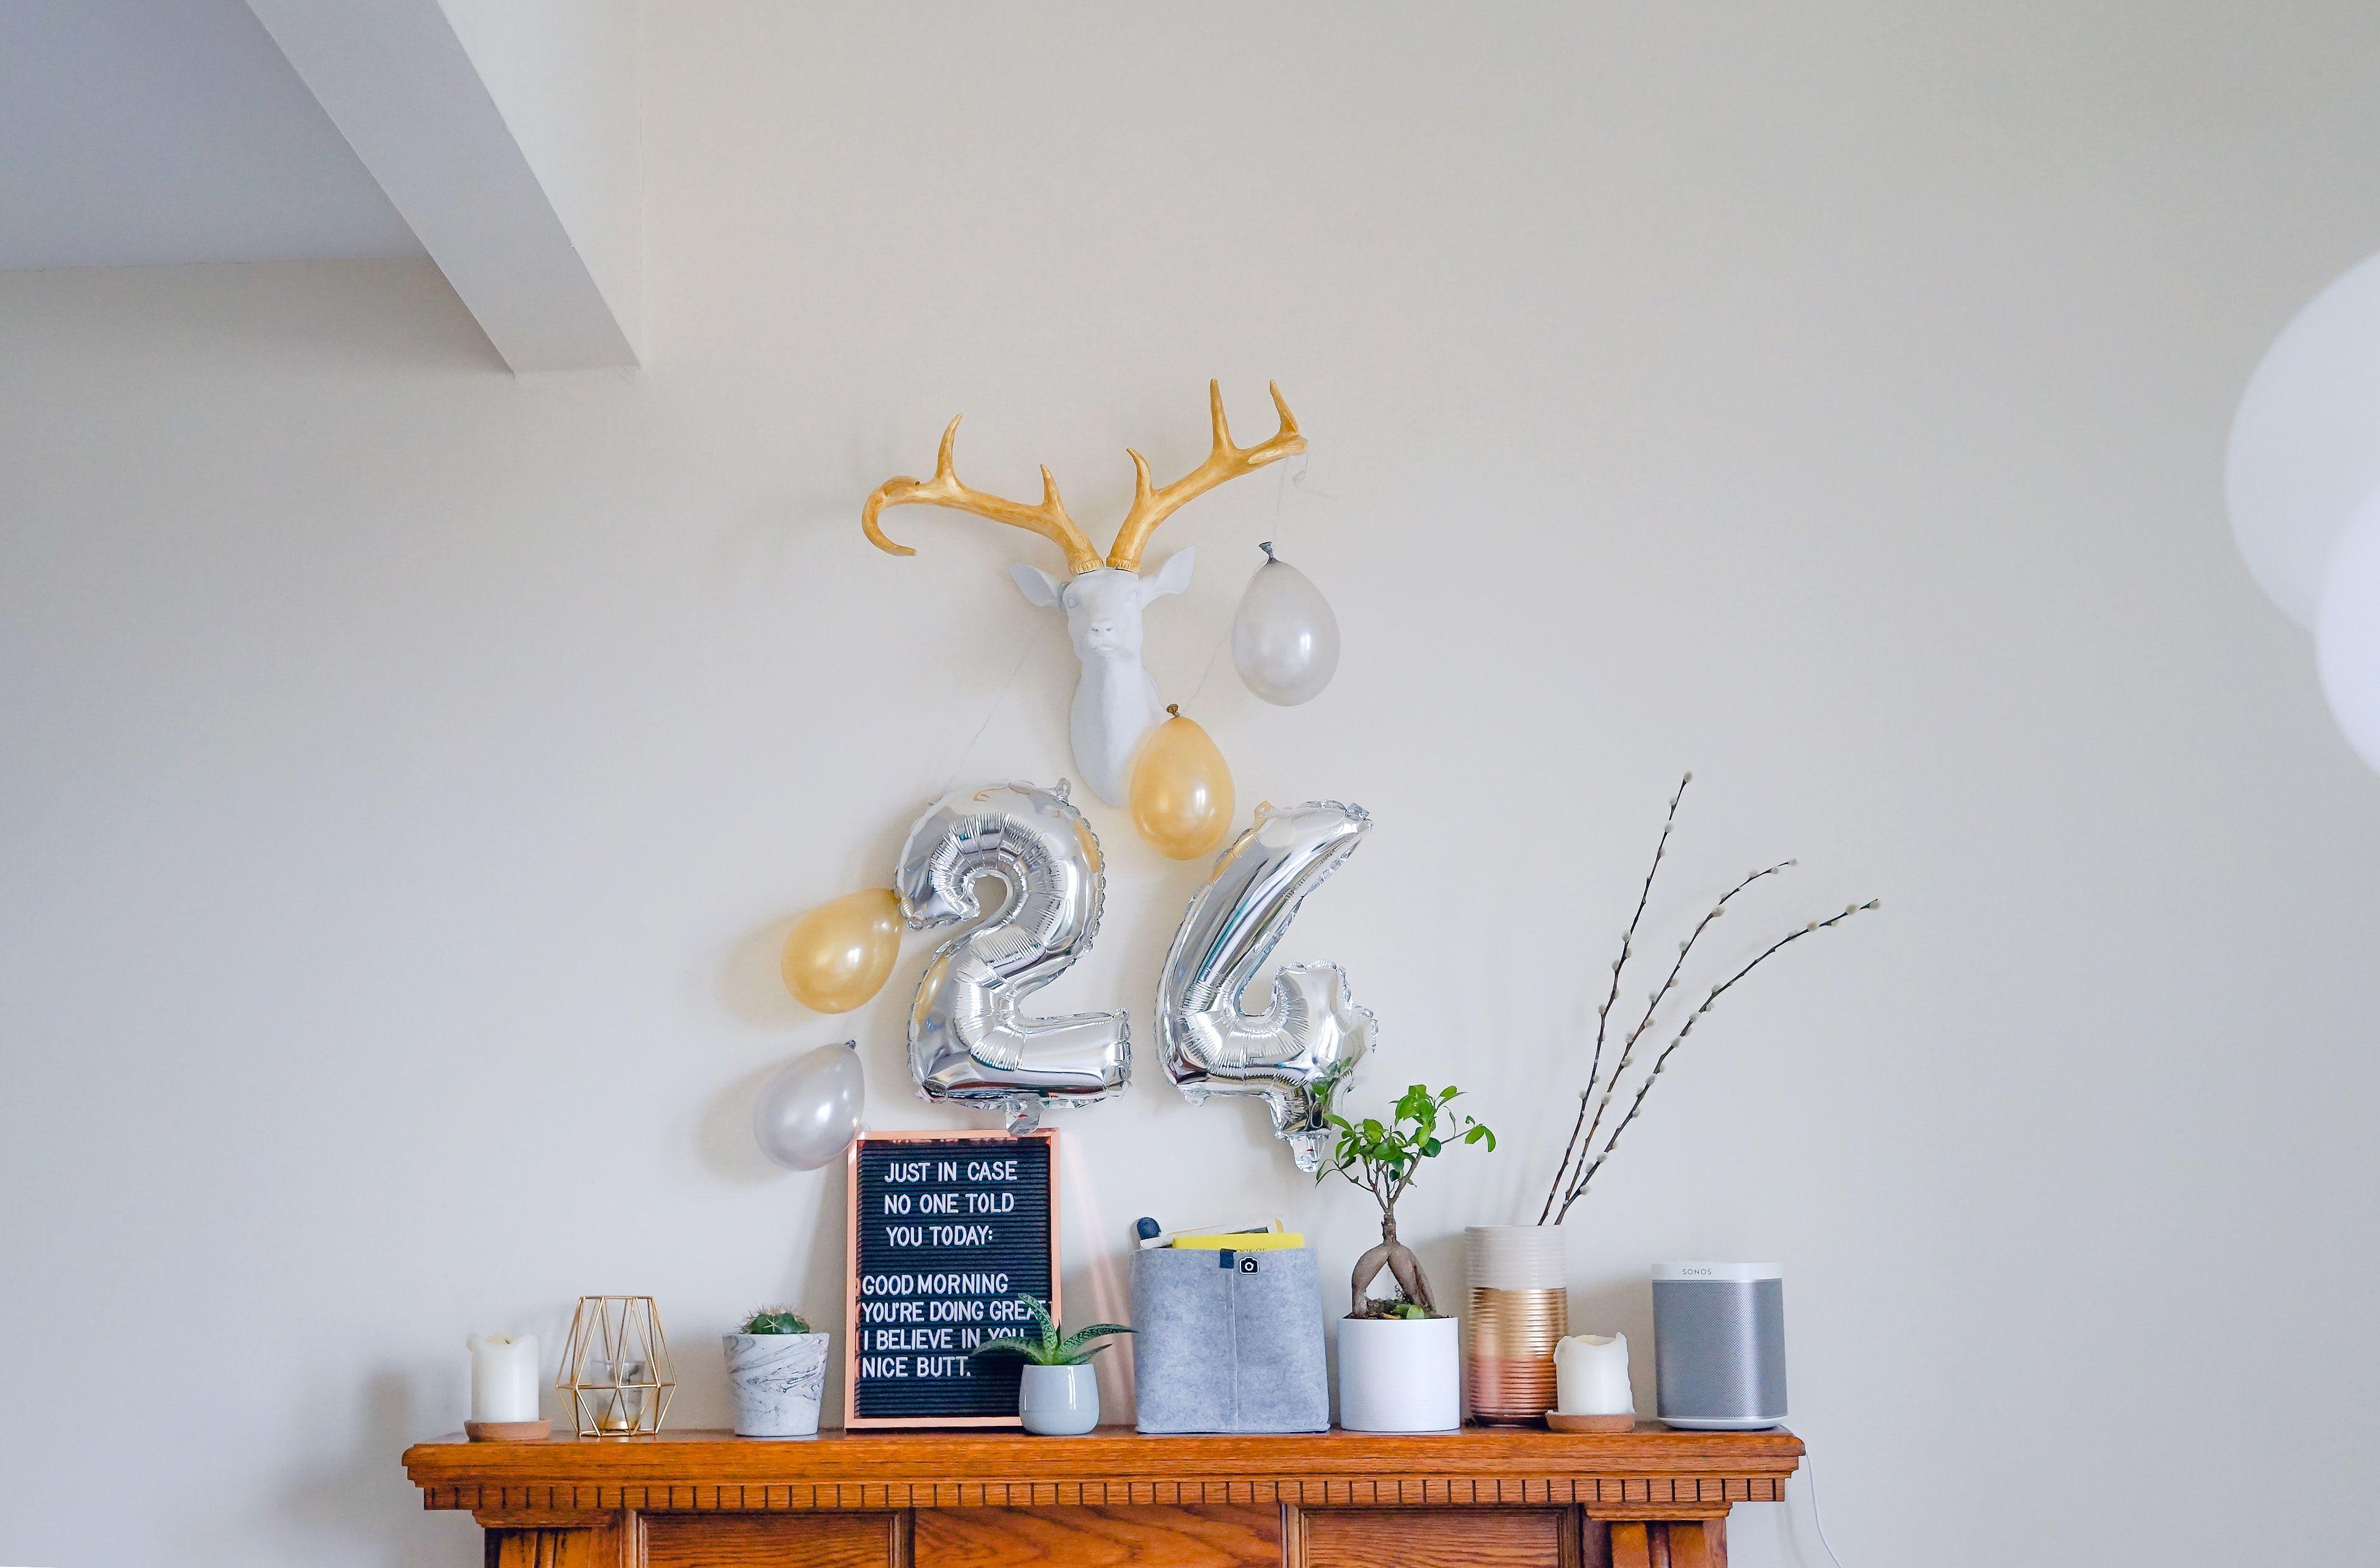 Brown Wooden Sideboard Living Room Decor Modern Indian Li